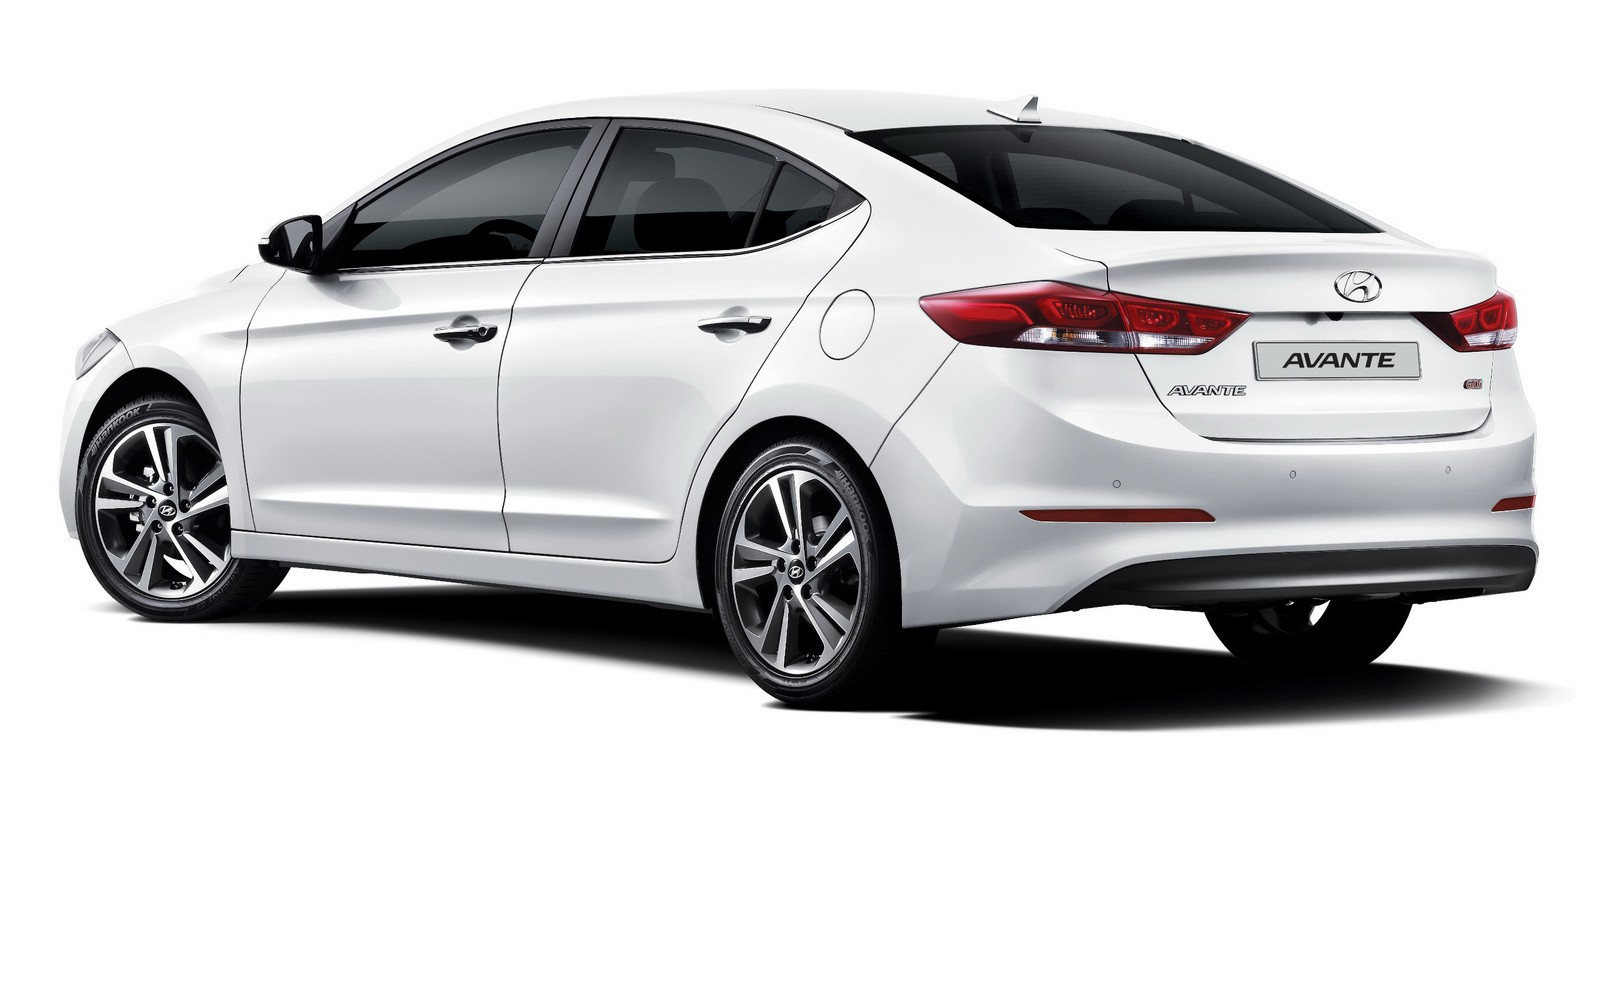 2016 2017 hyundai elantra sedan revealed in korea with 1 6 e vgt diesel engine autoevolution